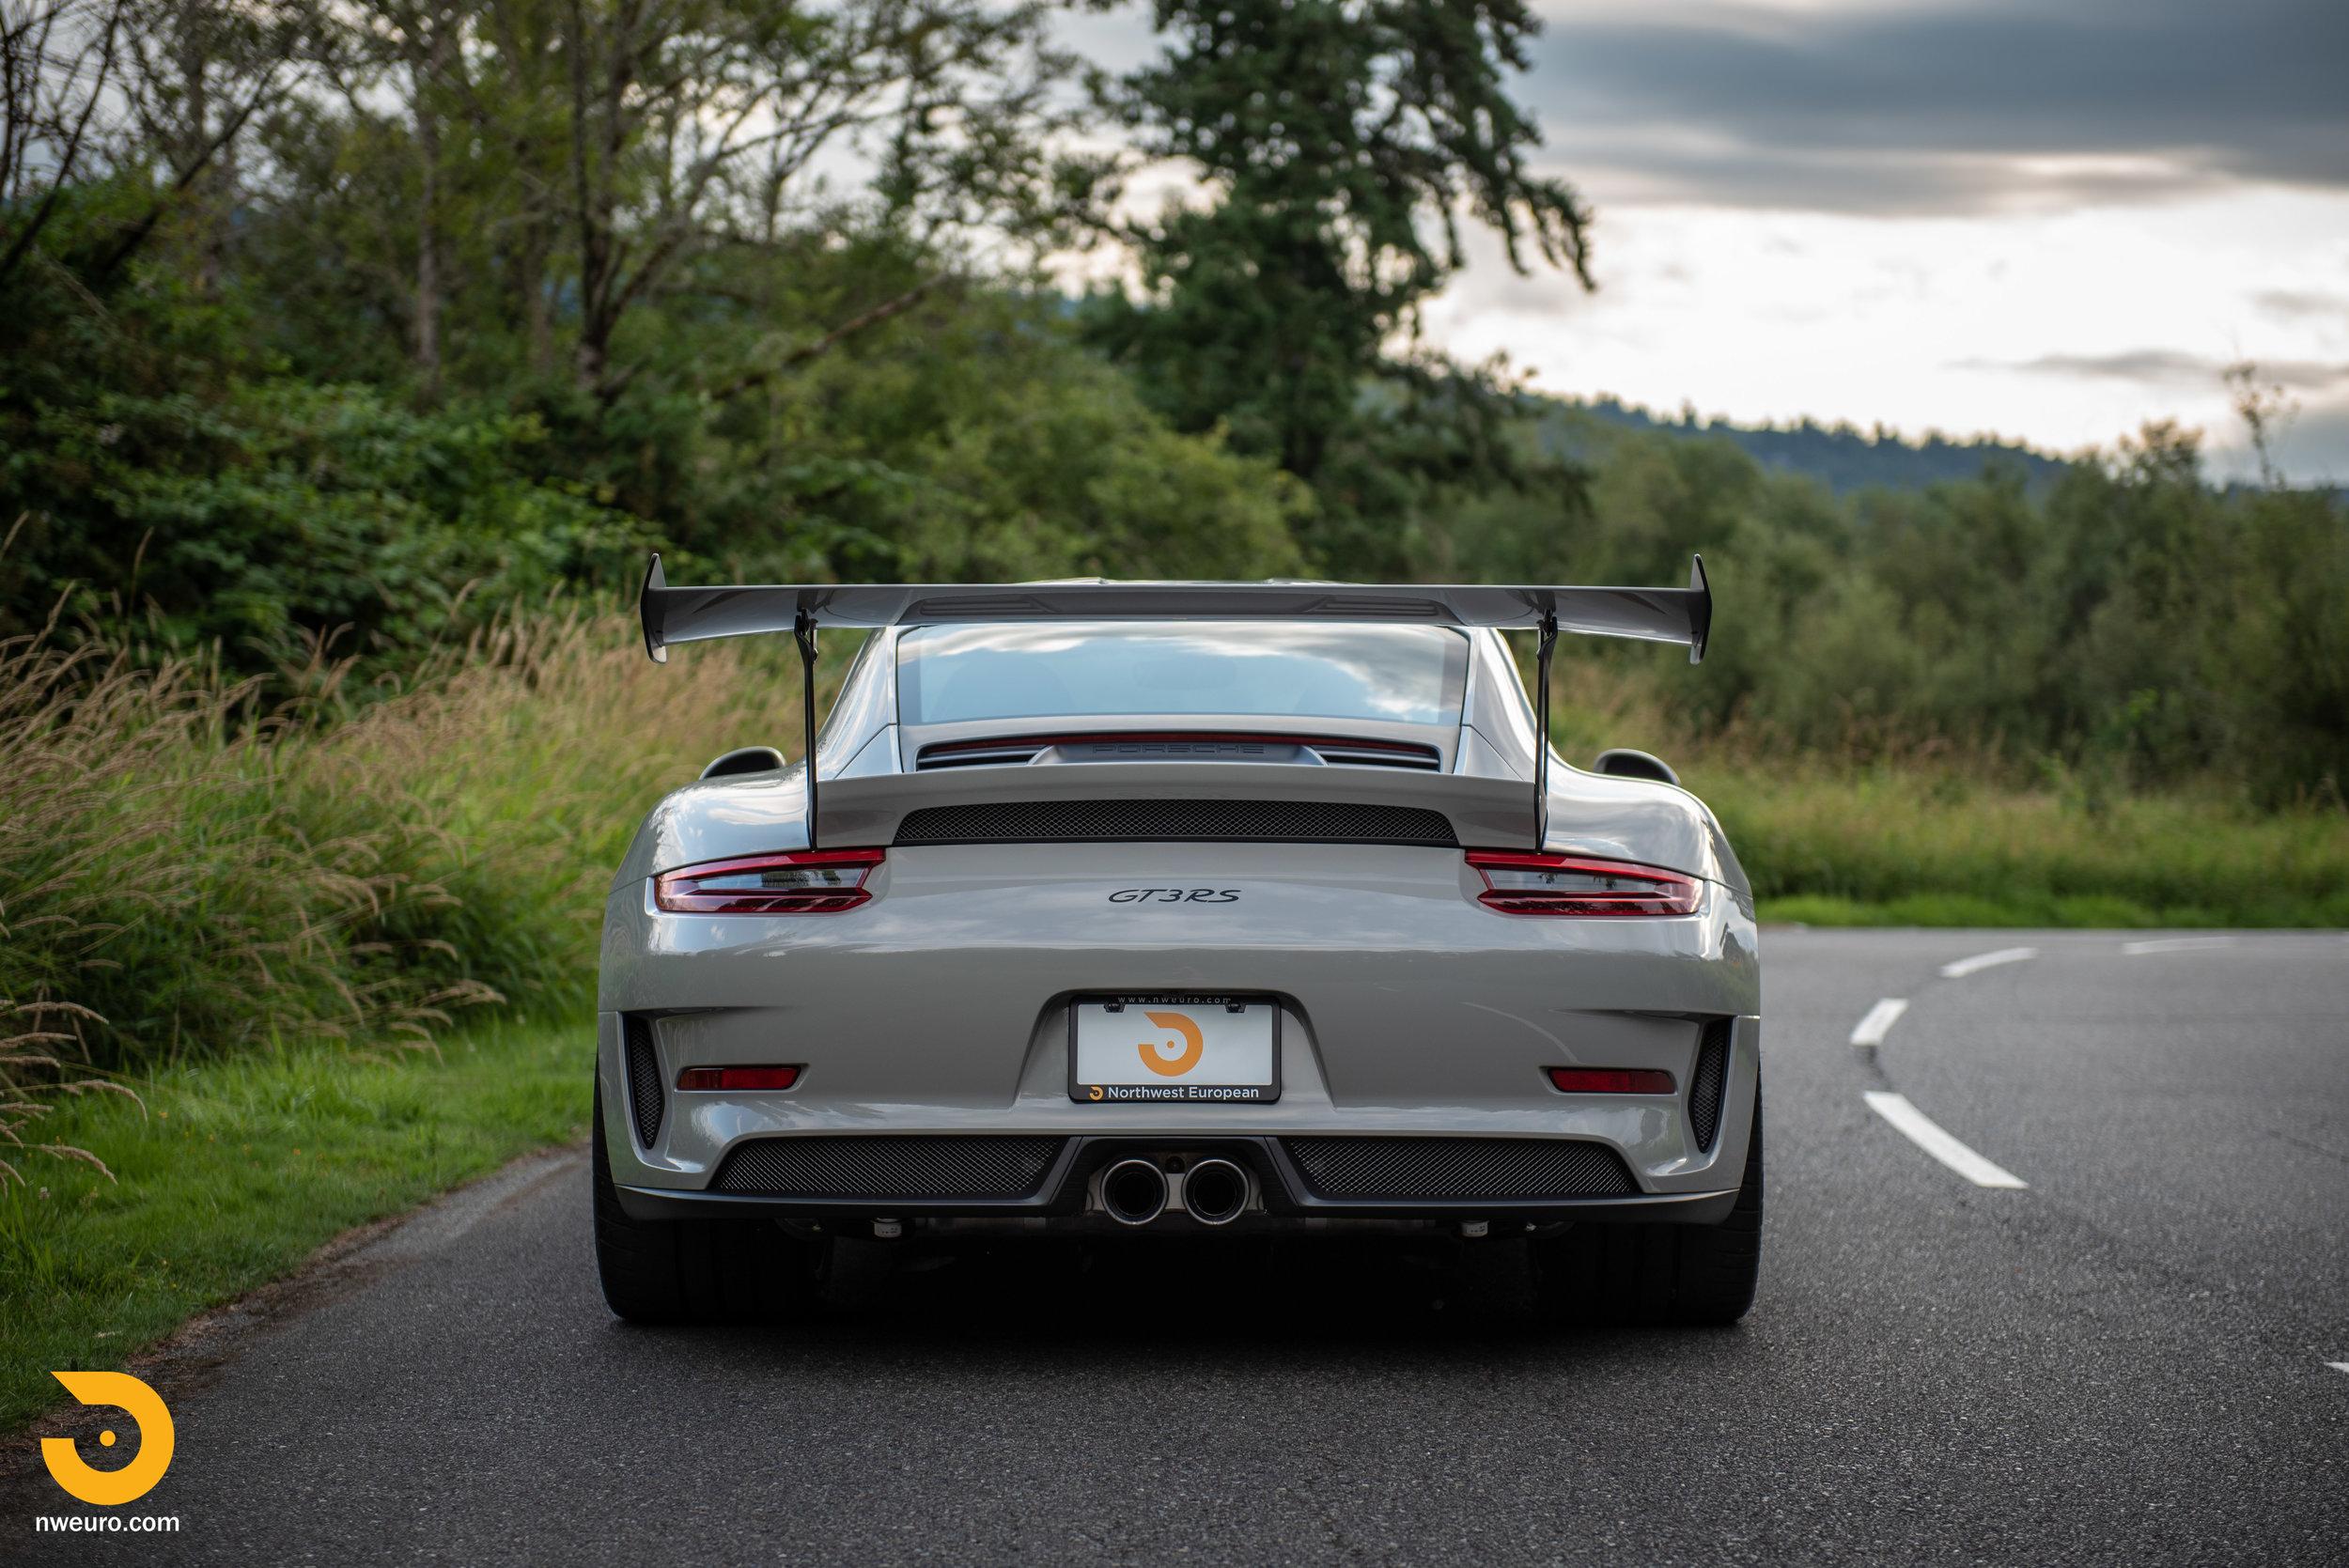 2019 Porsche GT3 RS - Chalk-55.jpg